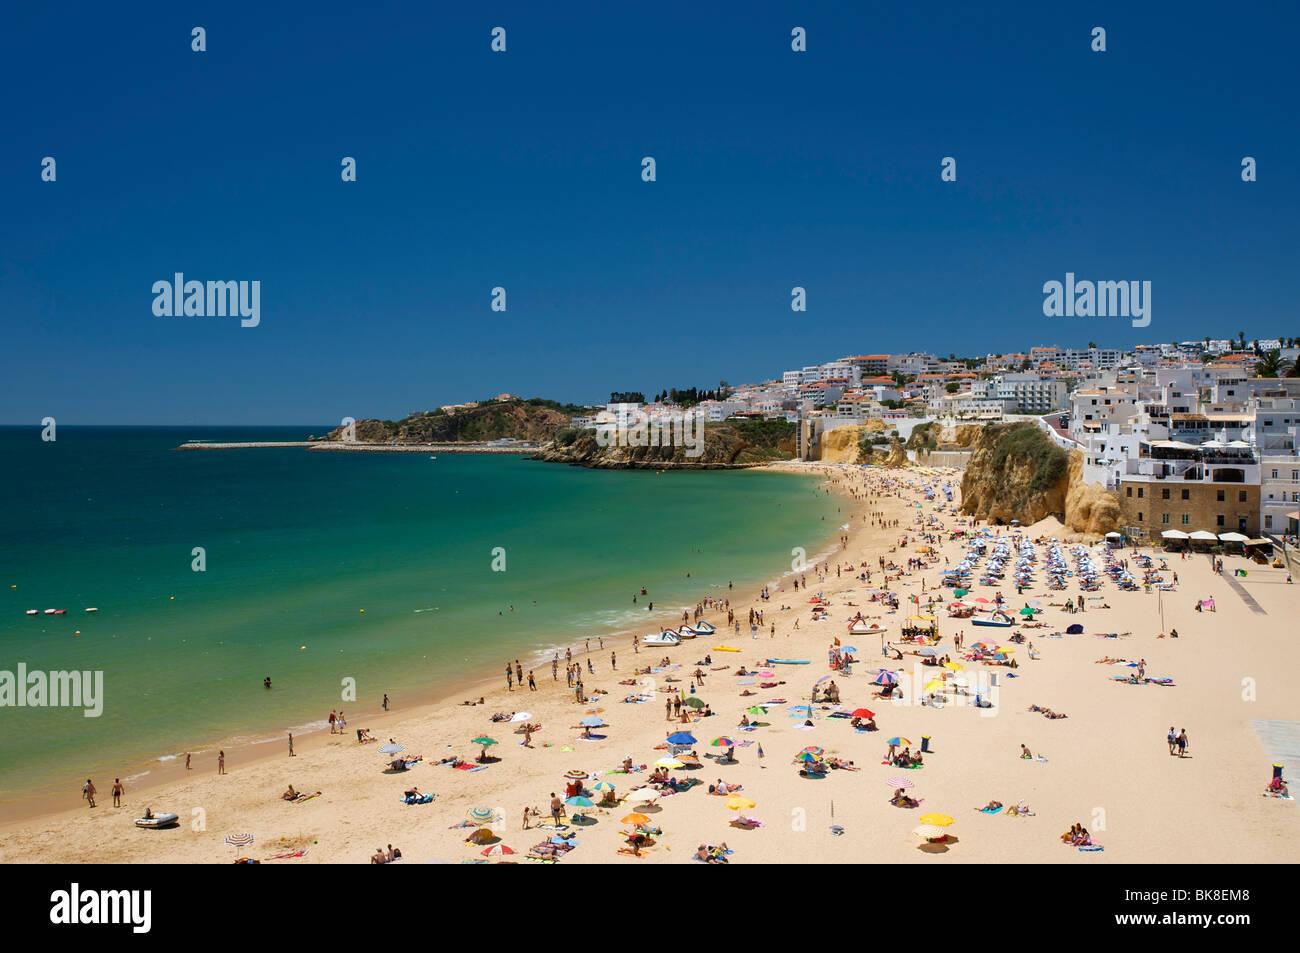 Beach in Albufeira, Algarve, Portugal, Europe - Stock Image